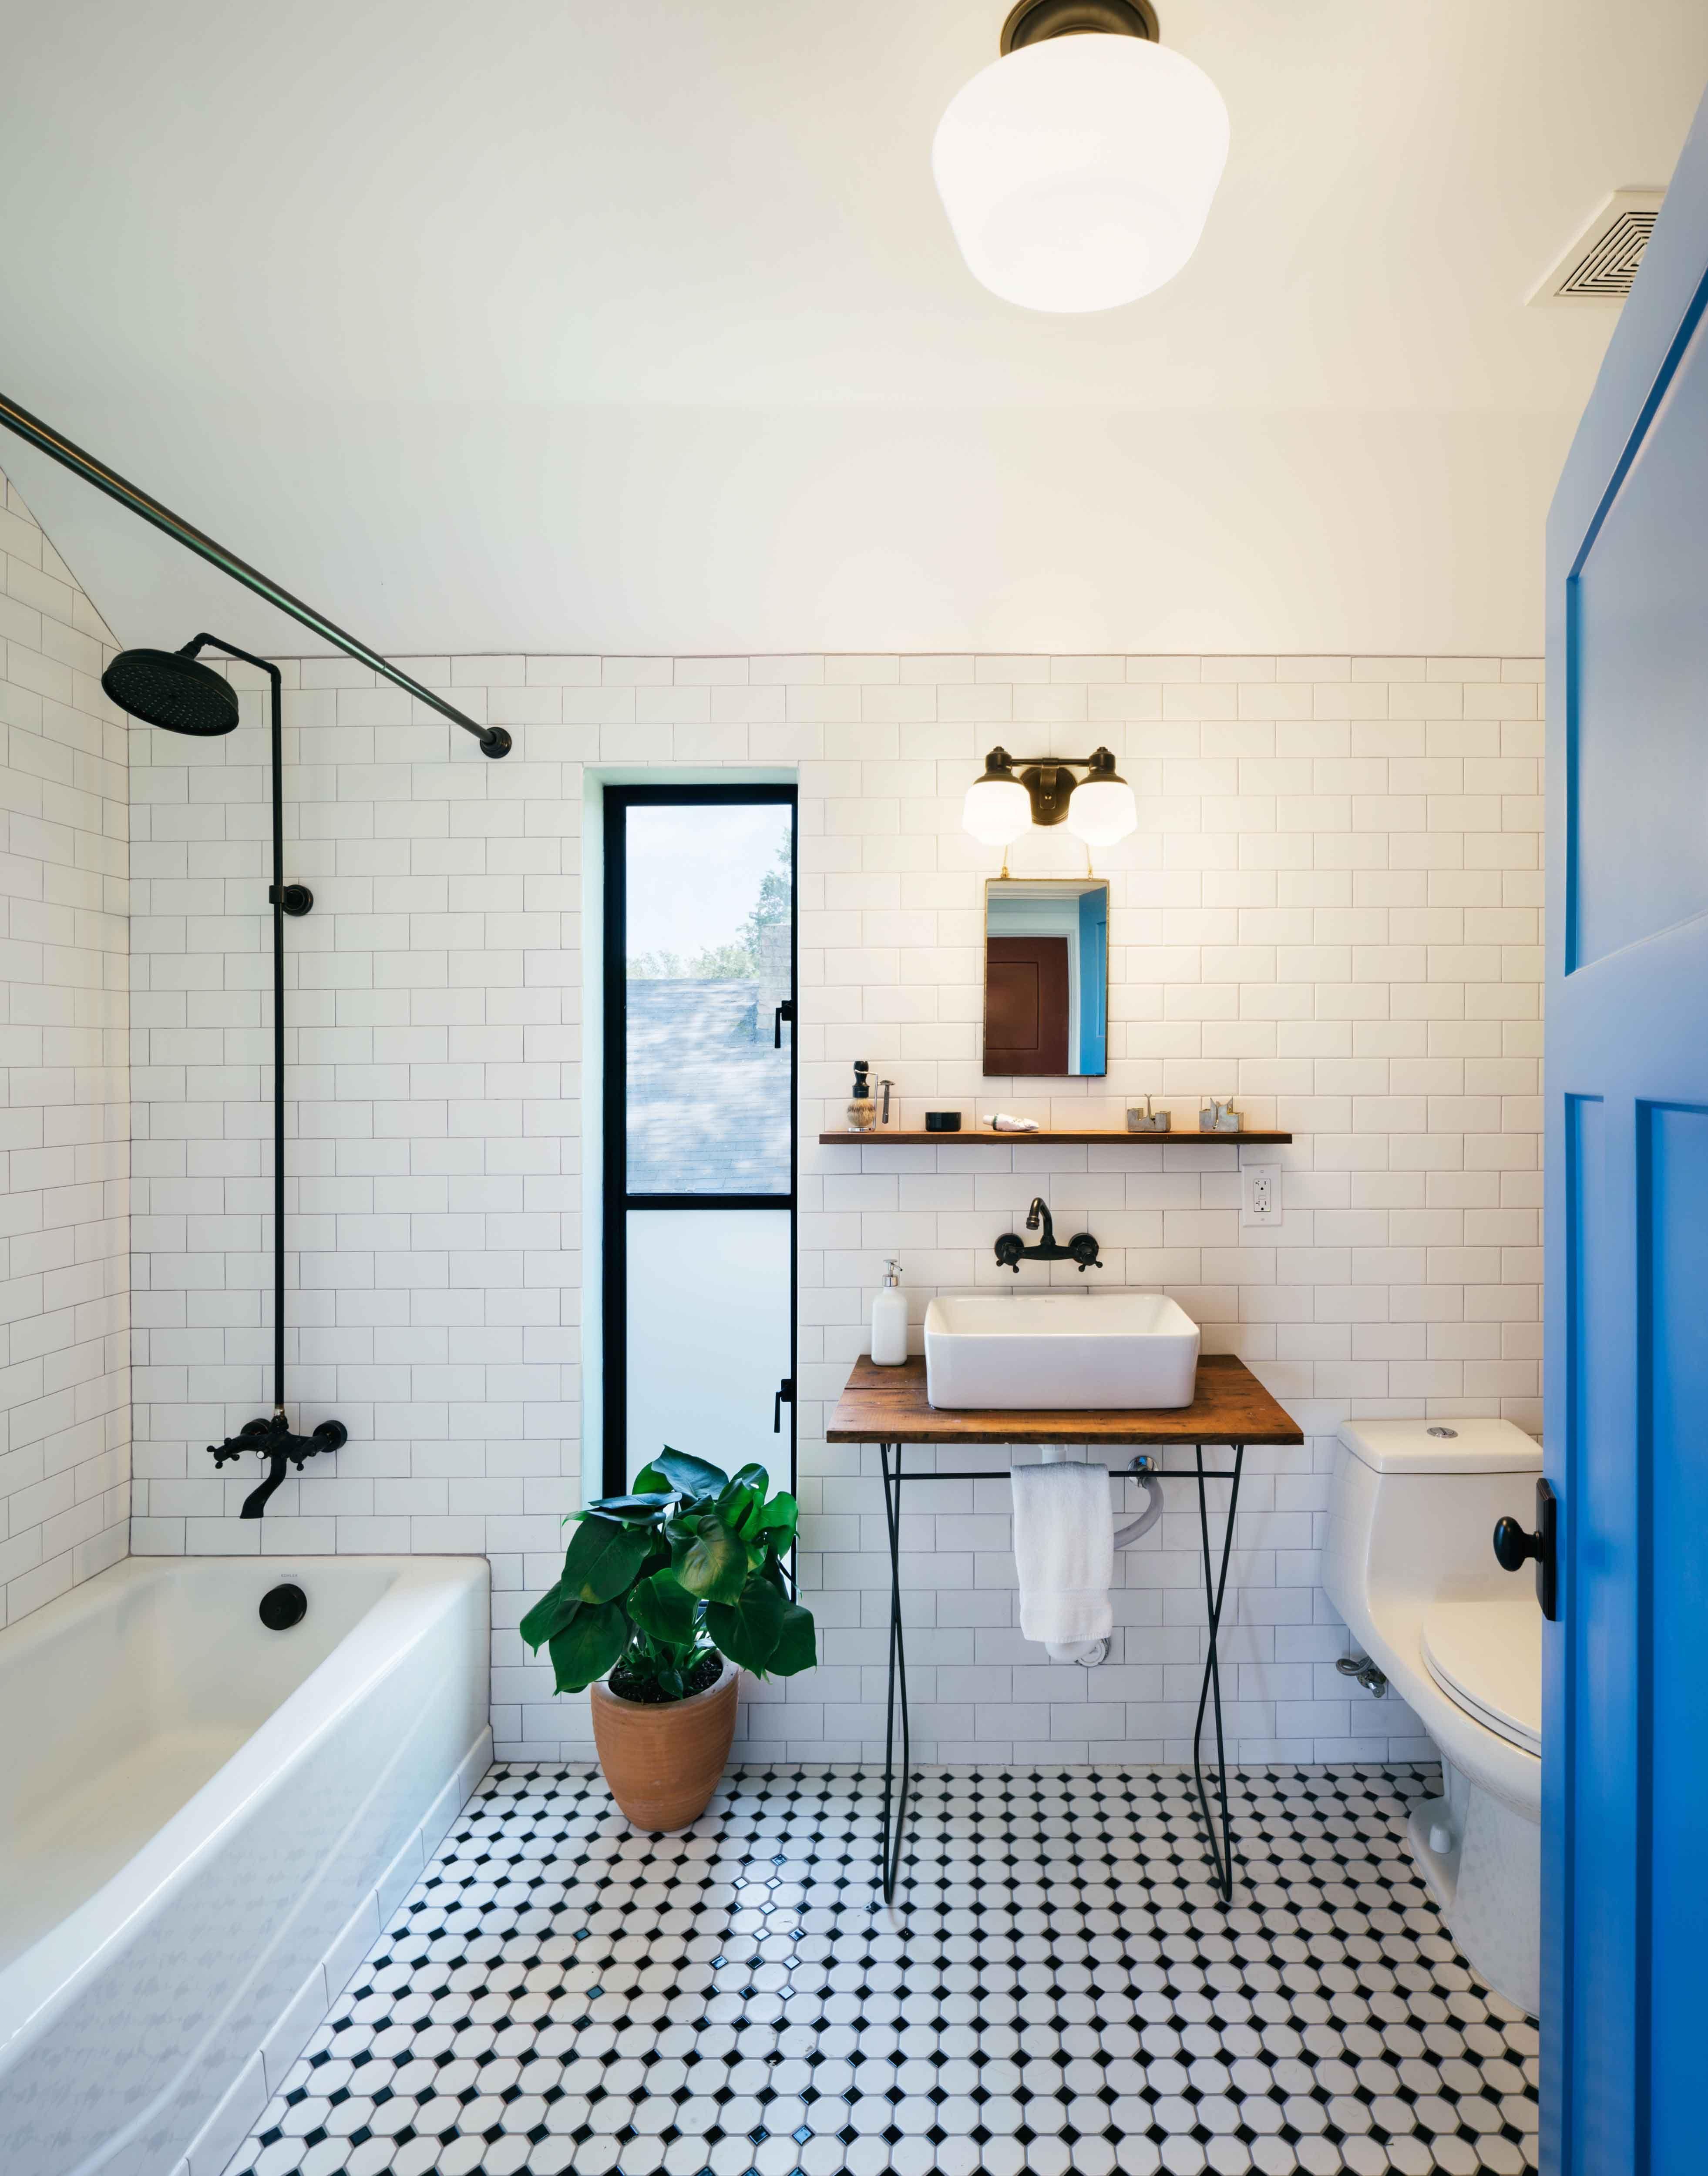 slideshow 5 white subway tile ideas for the kitchen or bathroom small bathroom decor bathrooms remodel bathroom interior